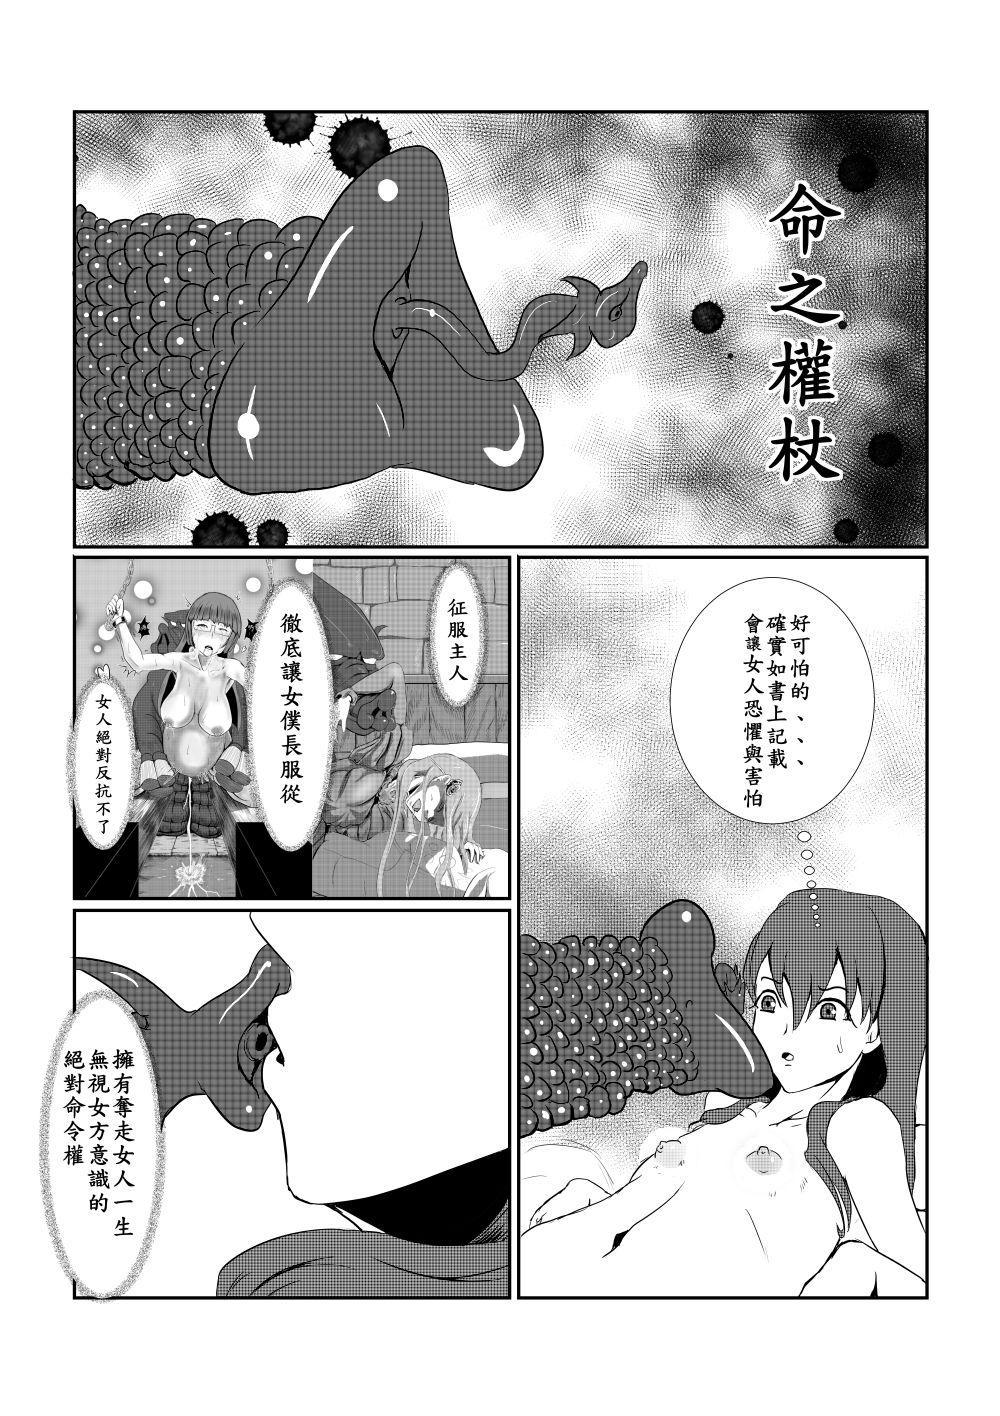 Maou Yuusha - Kachiku Kiki 3 61